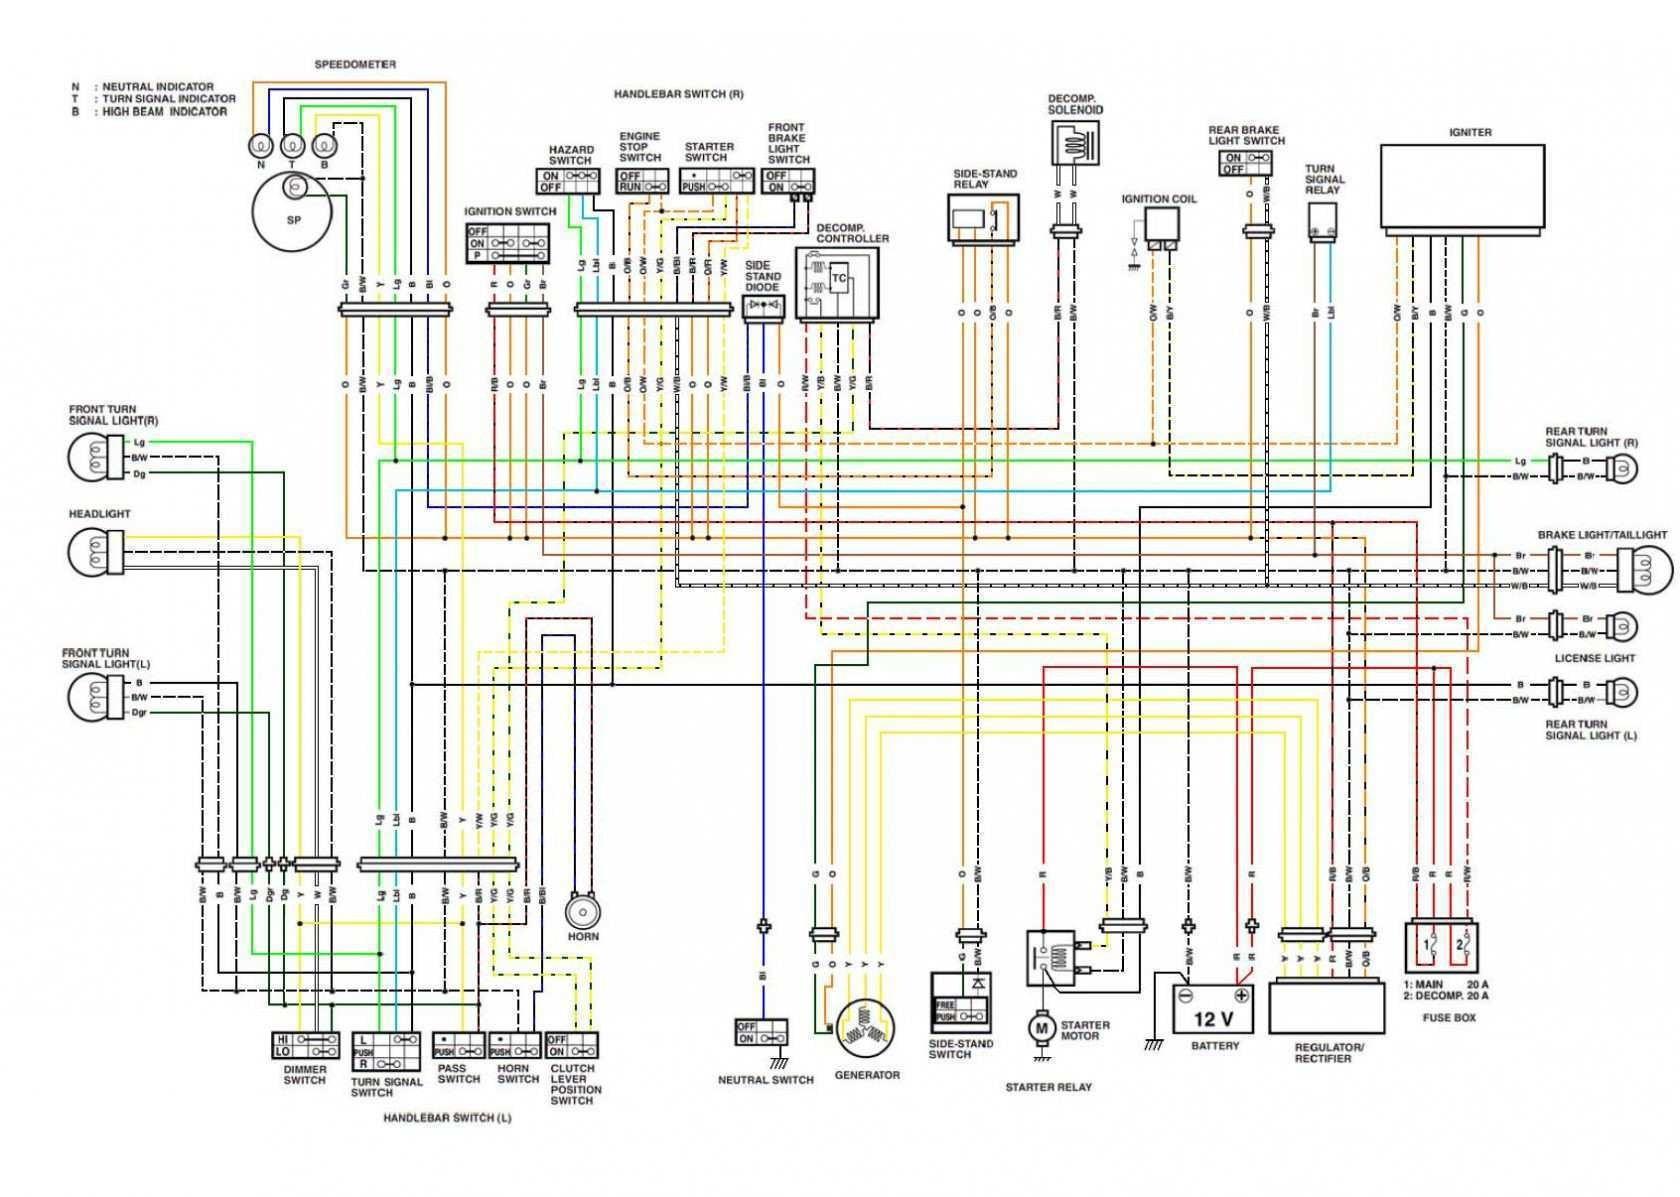 dyna ignition wiring diagram unique dyna ignition system diagram 2001 18 3lawi24 e280a2